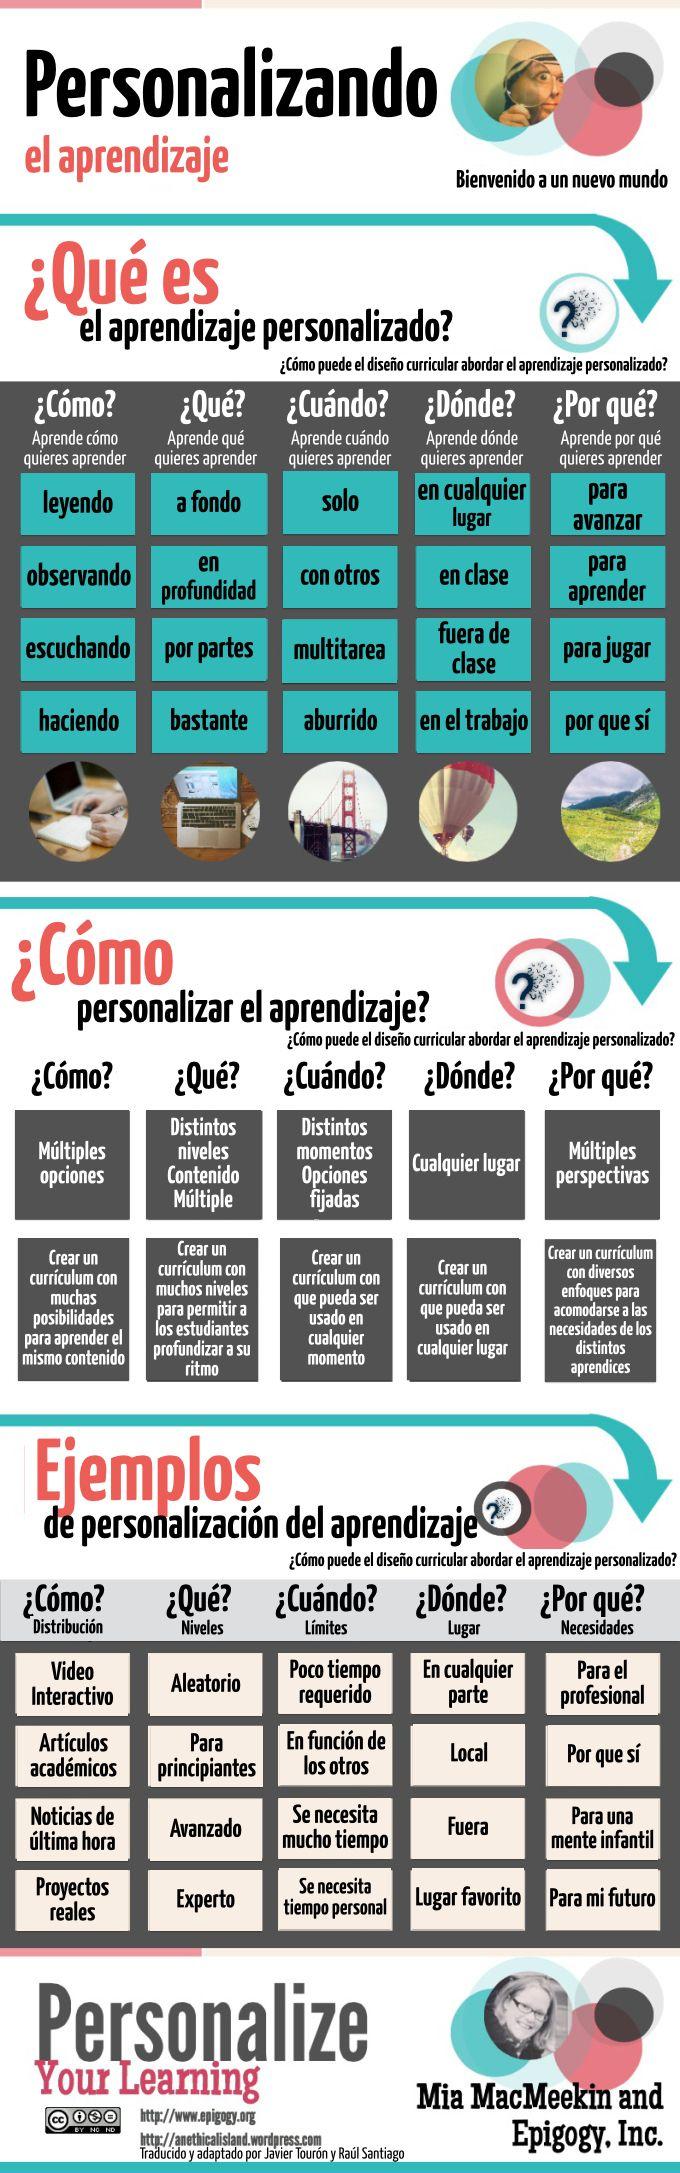 AprendizajePersonalizado-Infografía-BlogGesvin